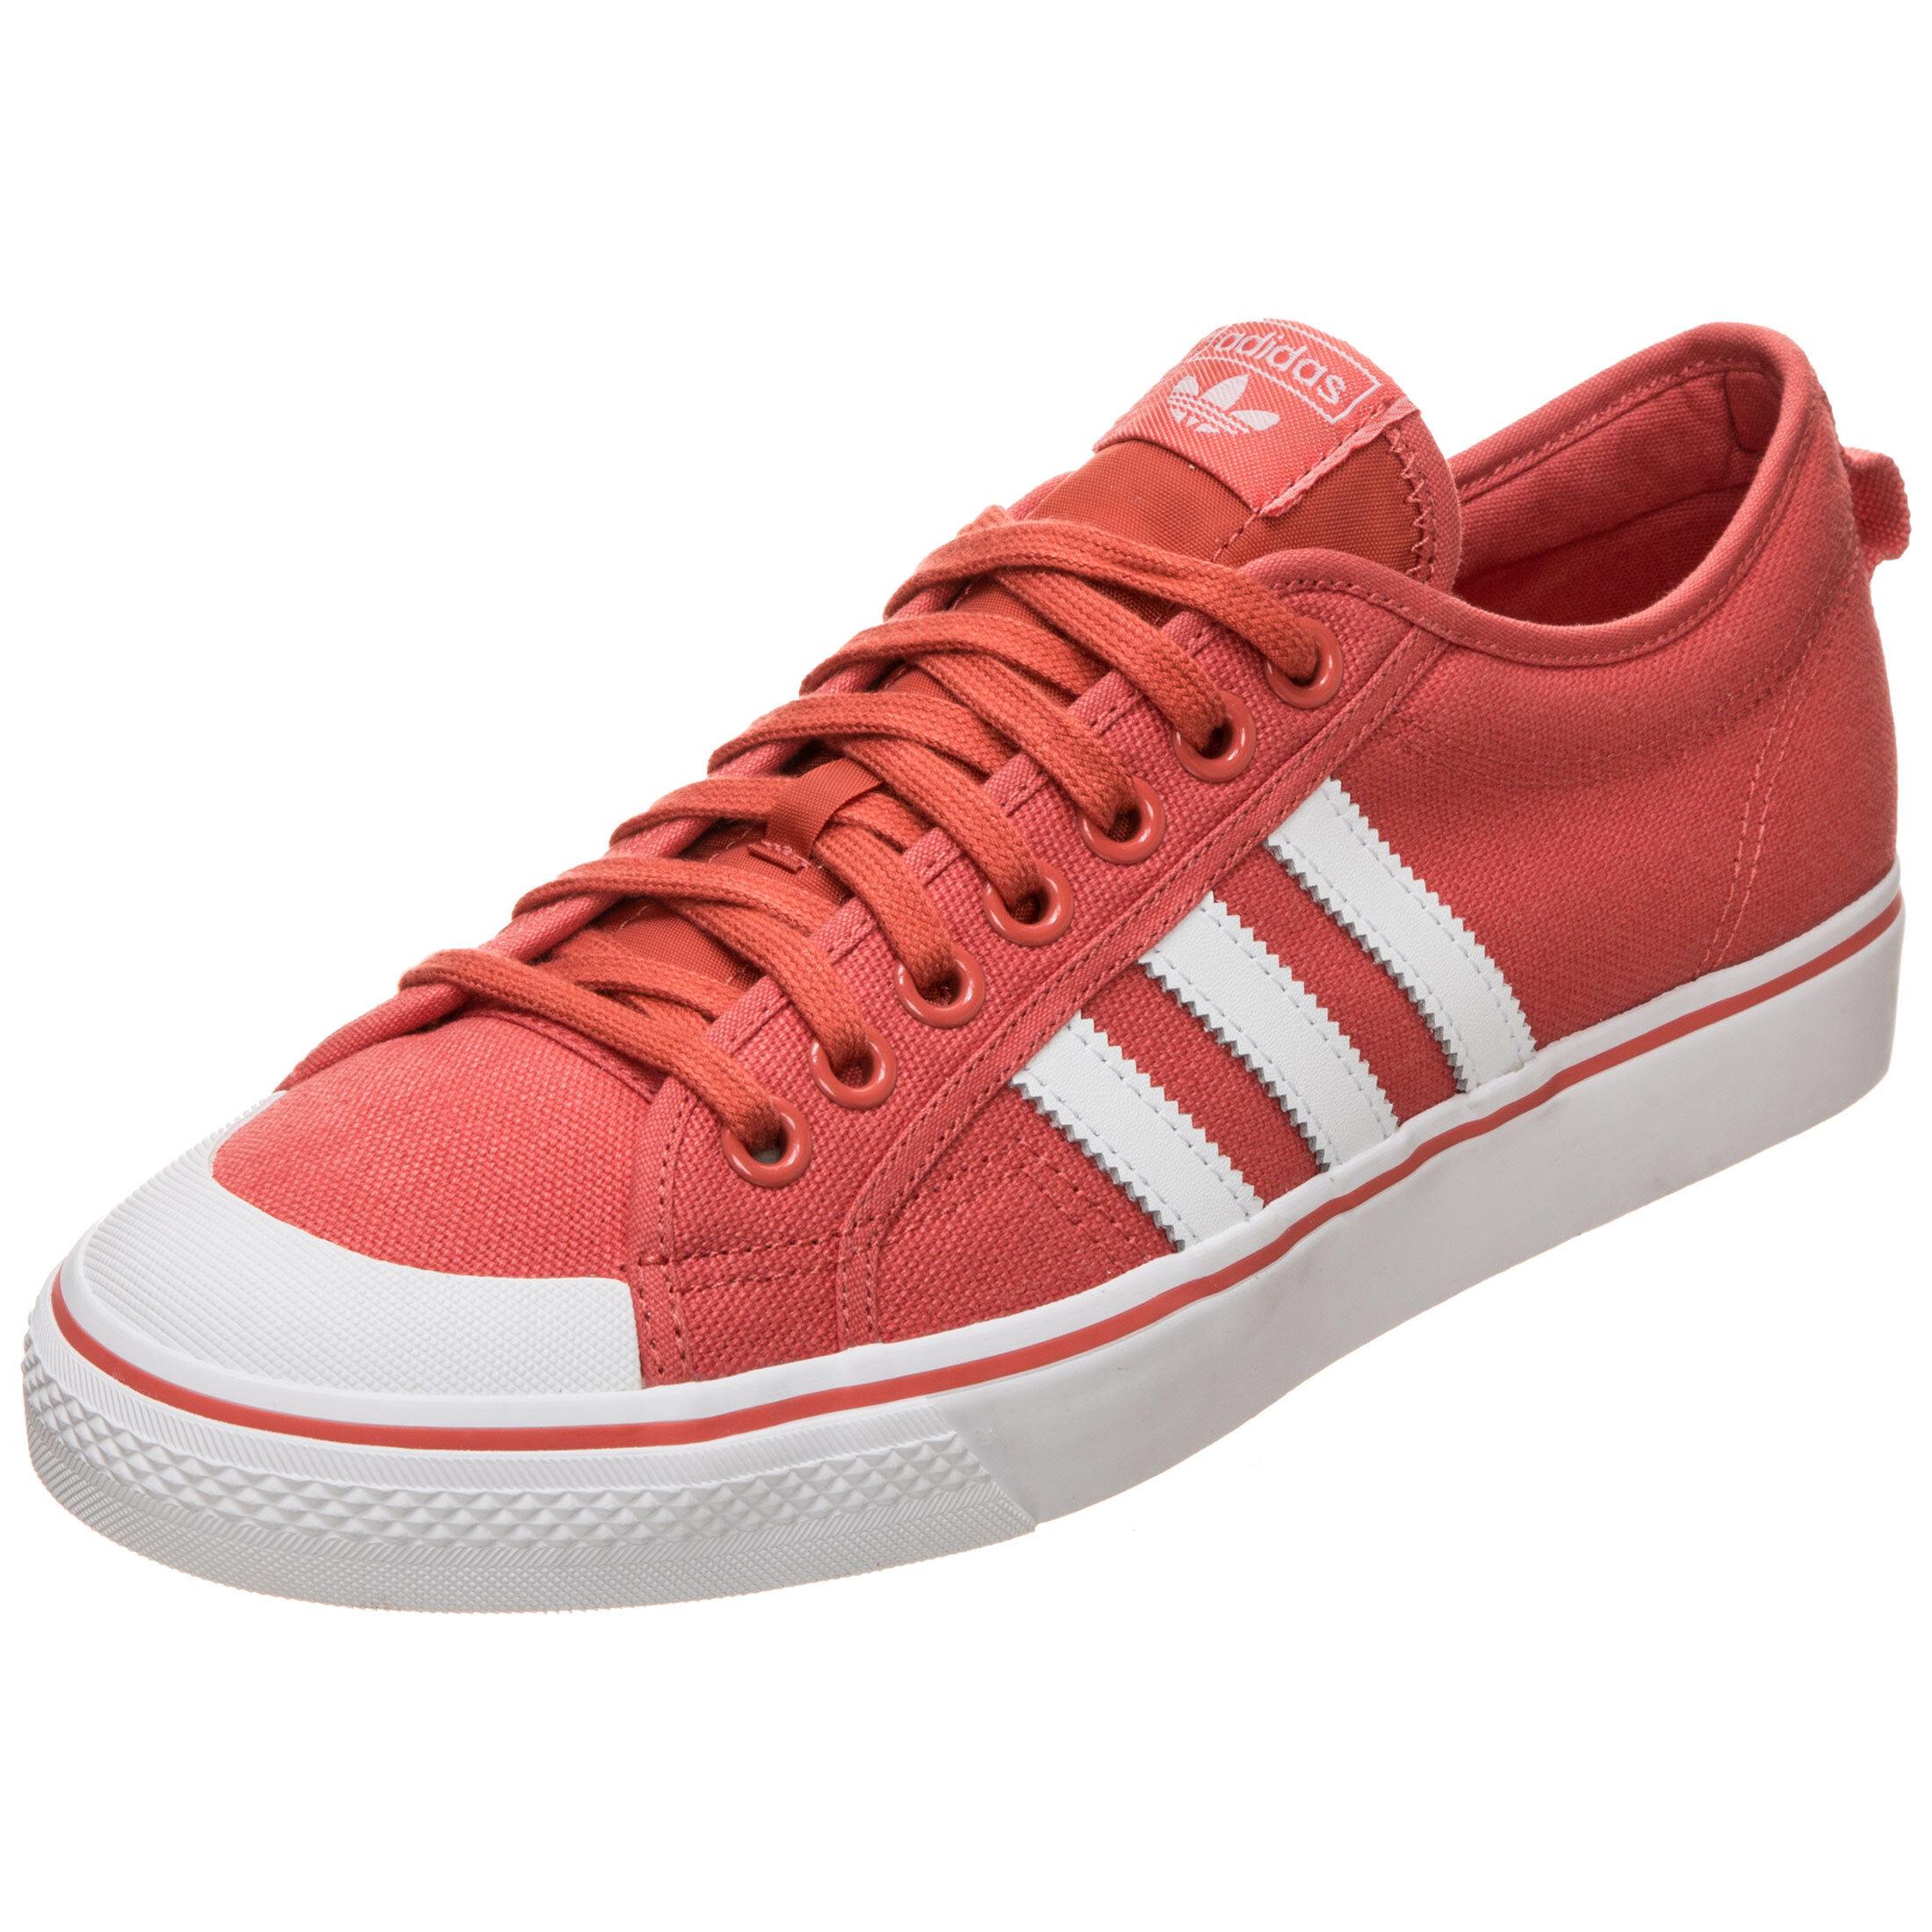 Adidas Nizza Kids ab 27,89 € | Preisvergleich bei